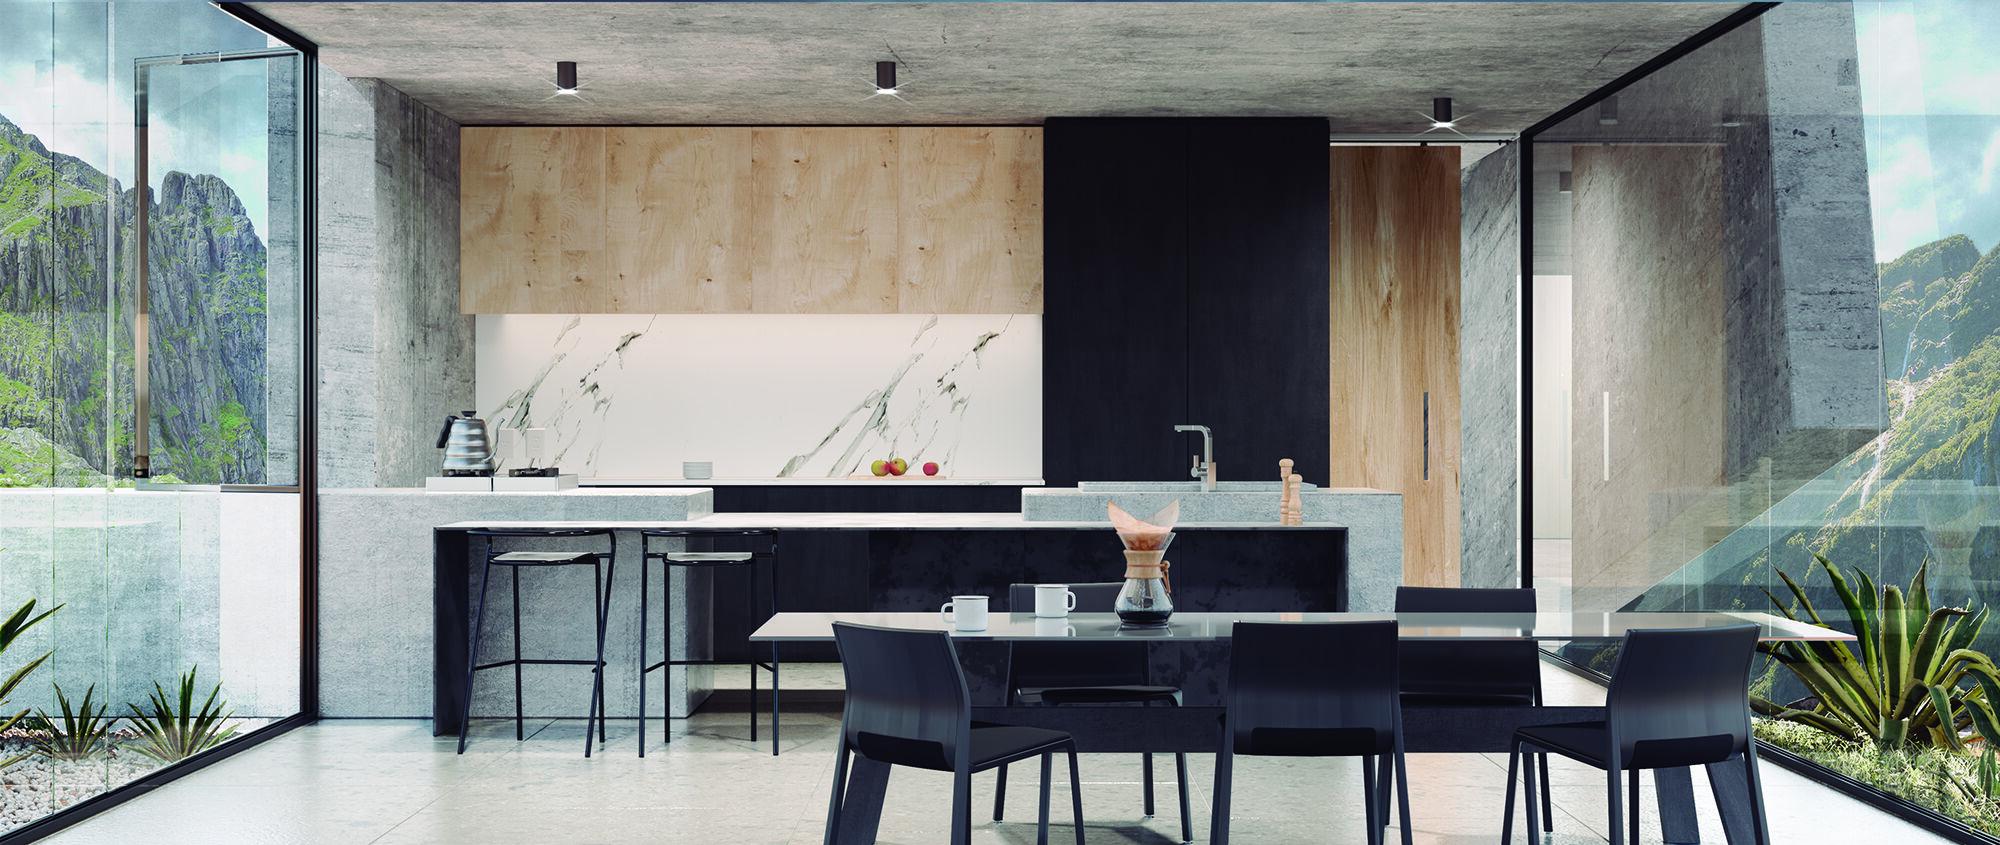 WTBA House kitchen